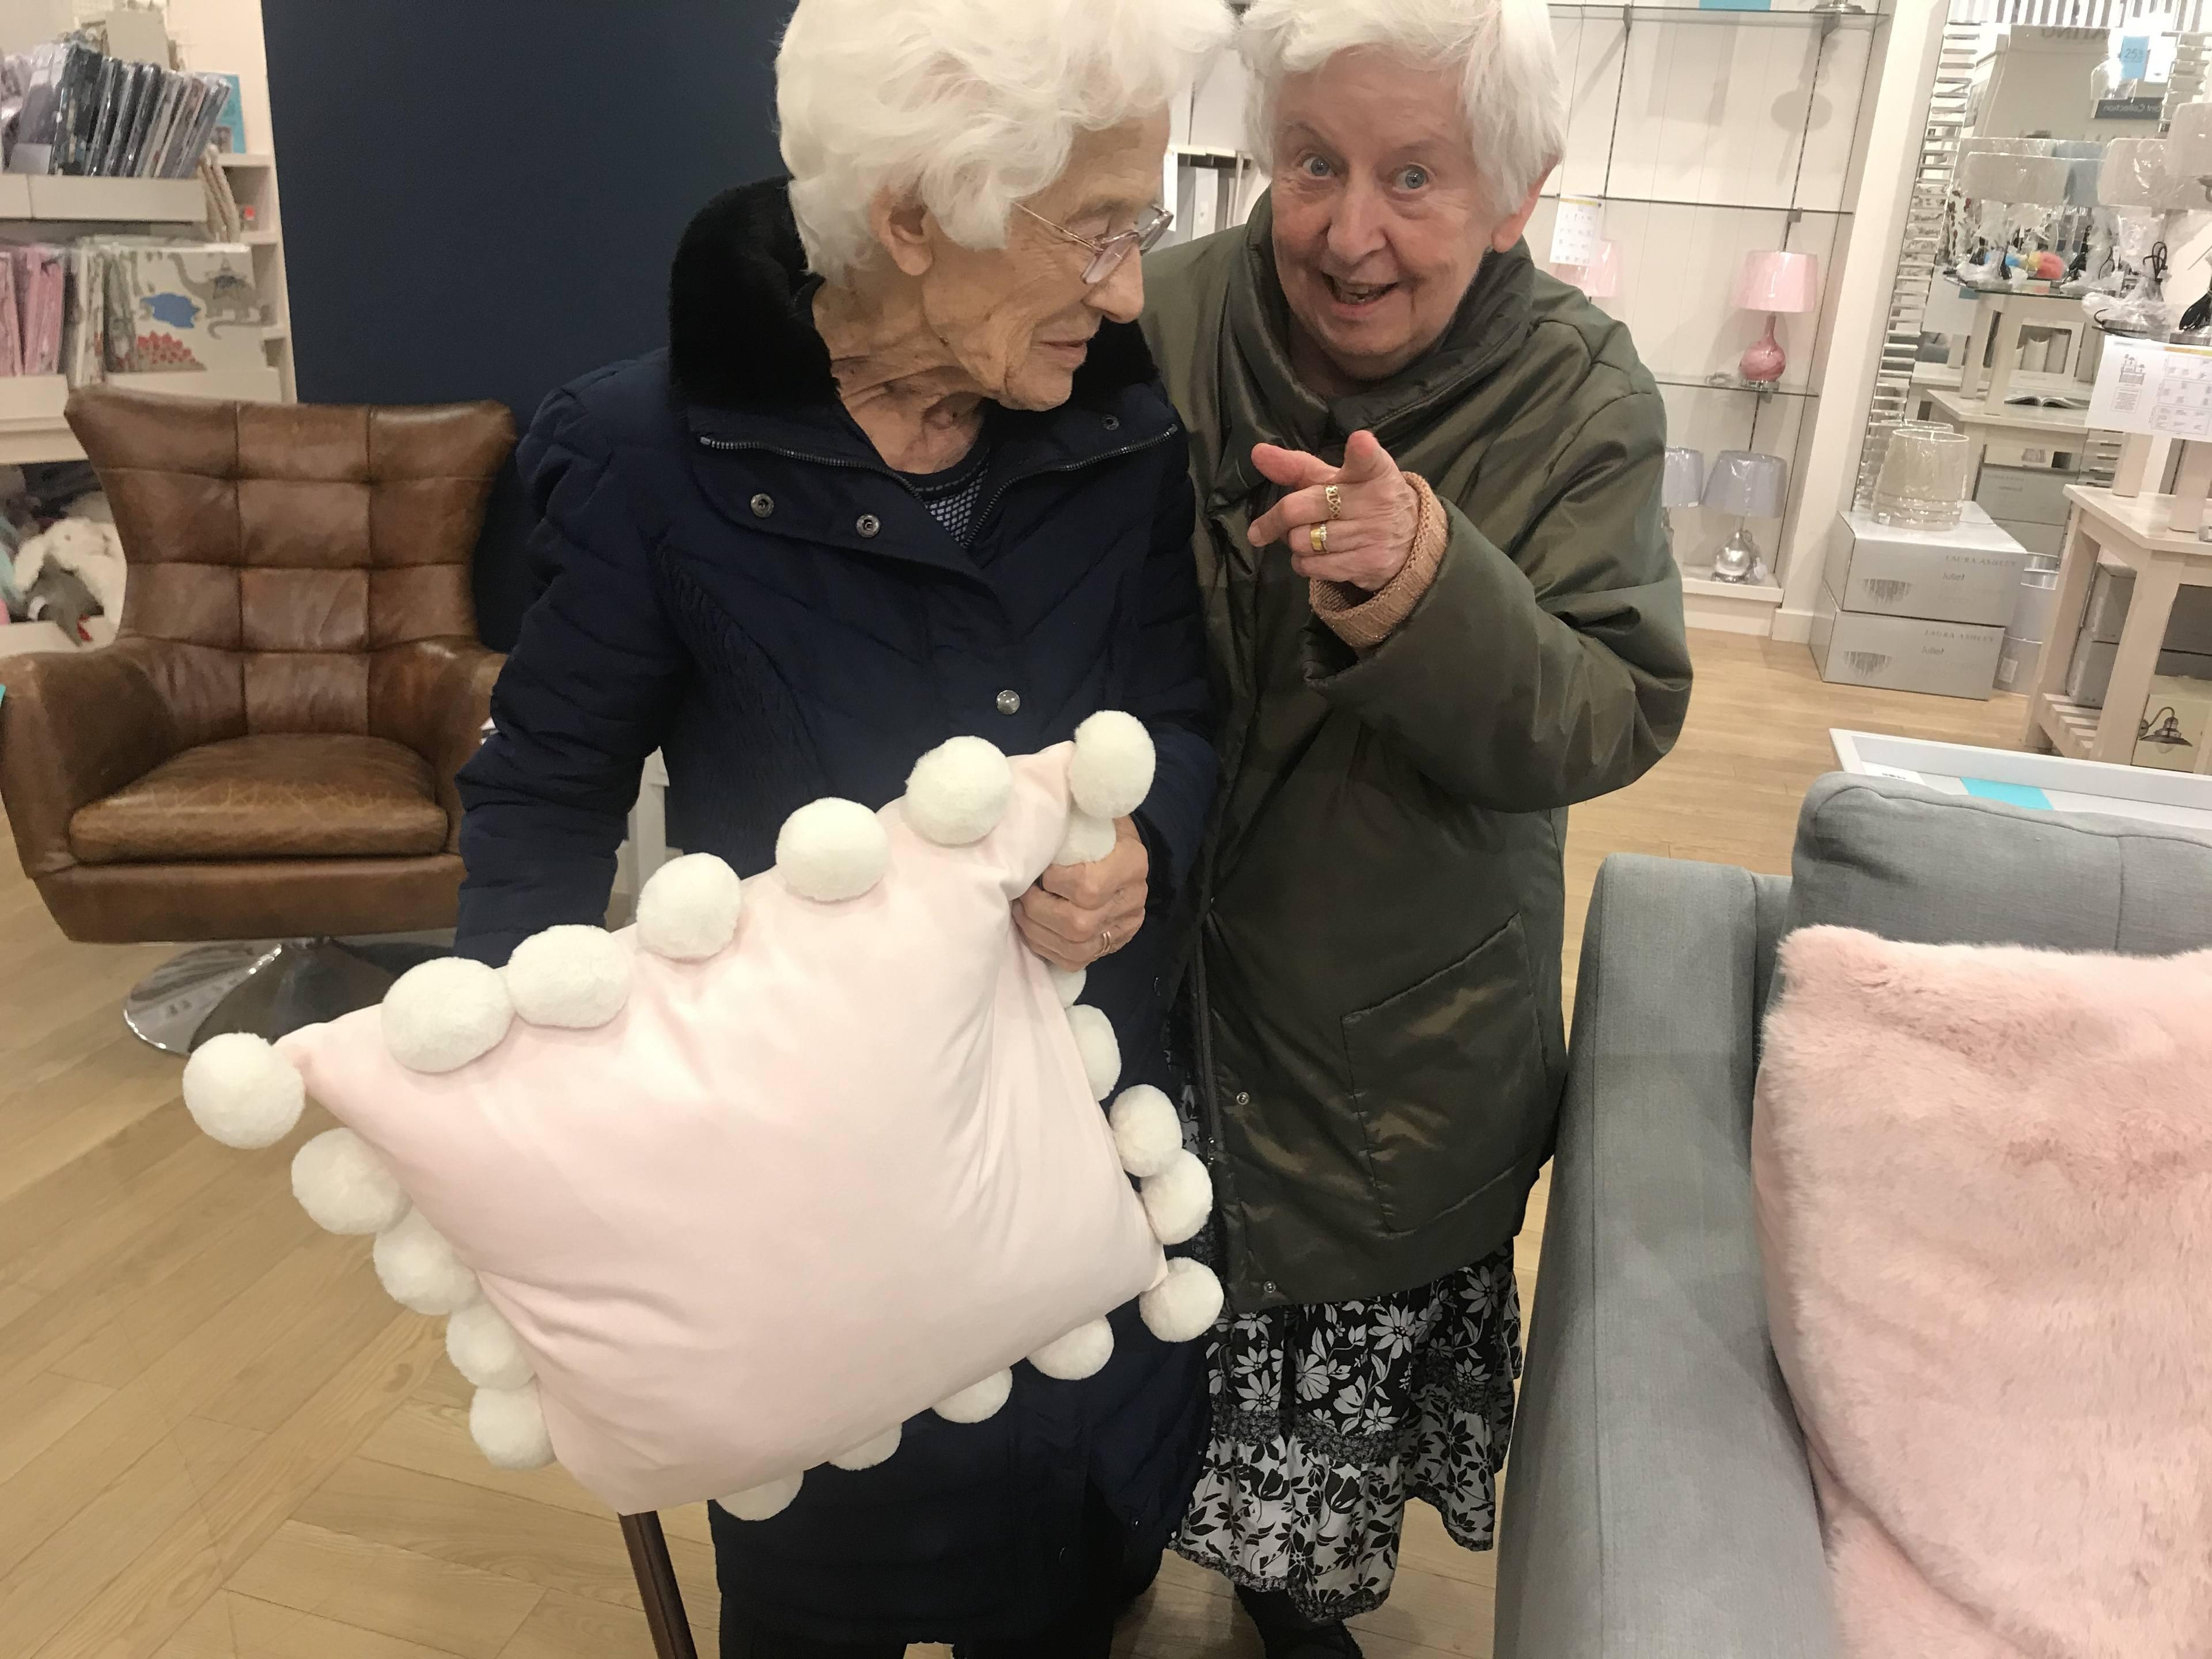 Winn and Cheryl shopping for cushions